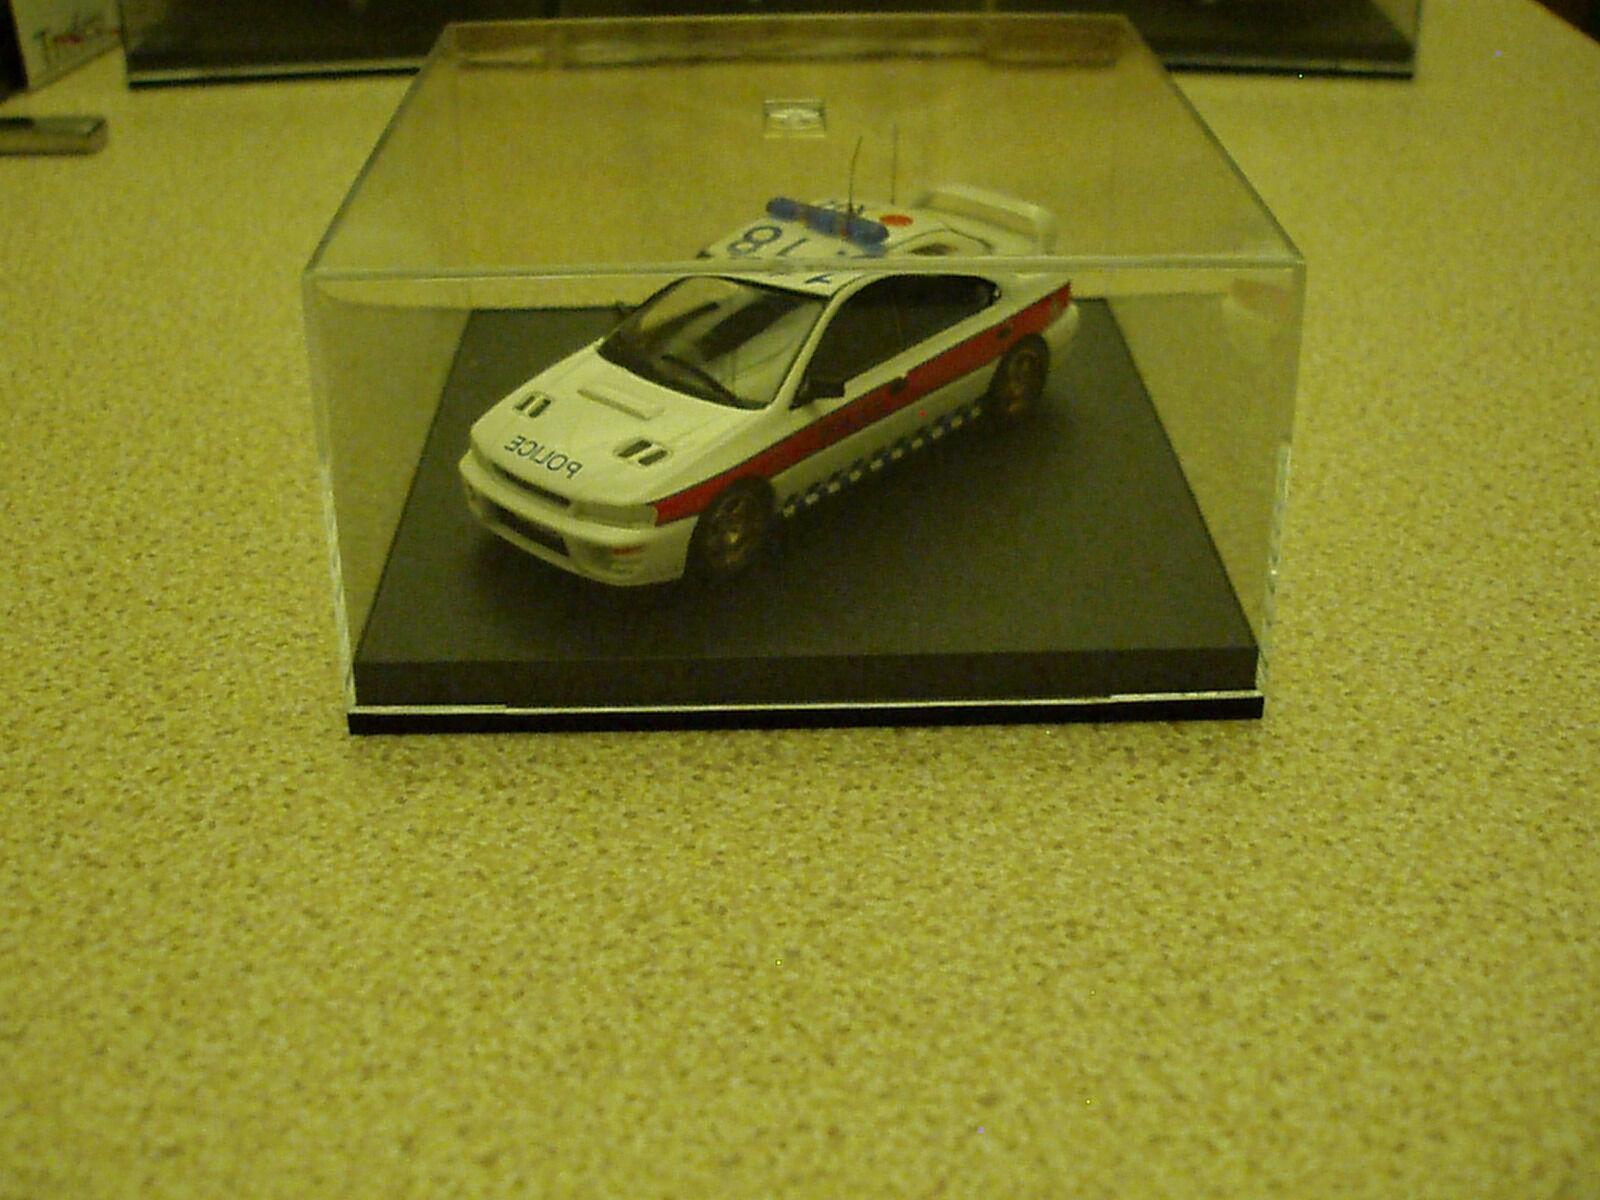 Trofeu 624 Subaru Impreza WRX Humberside Police (GB) 1 43 Untouched